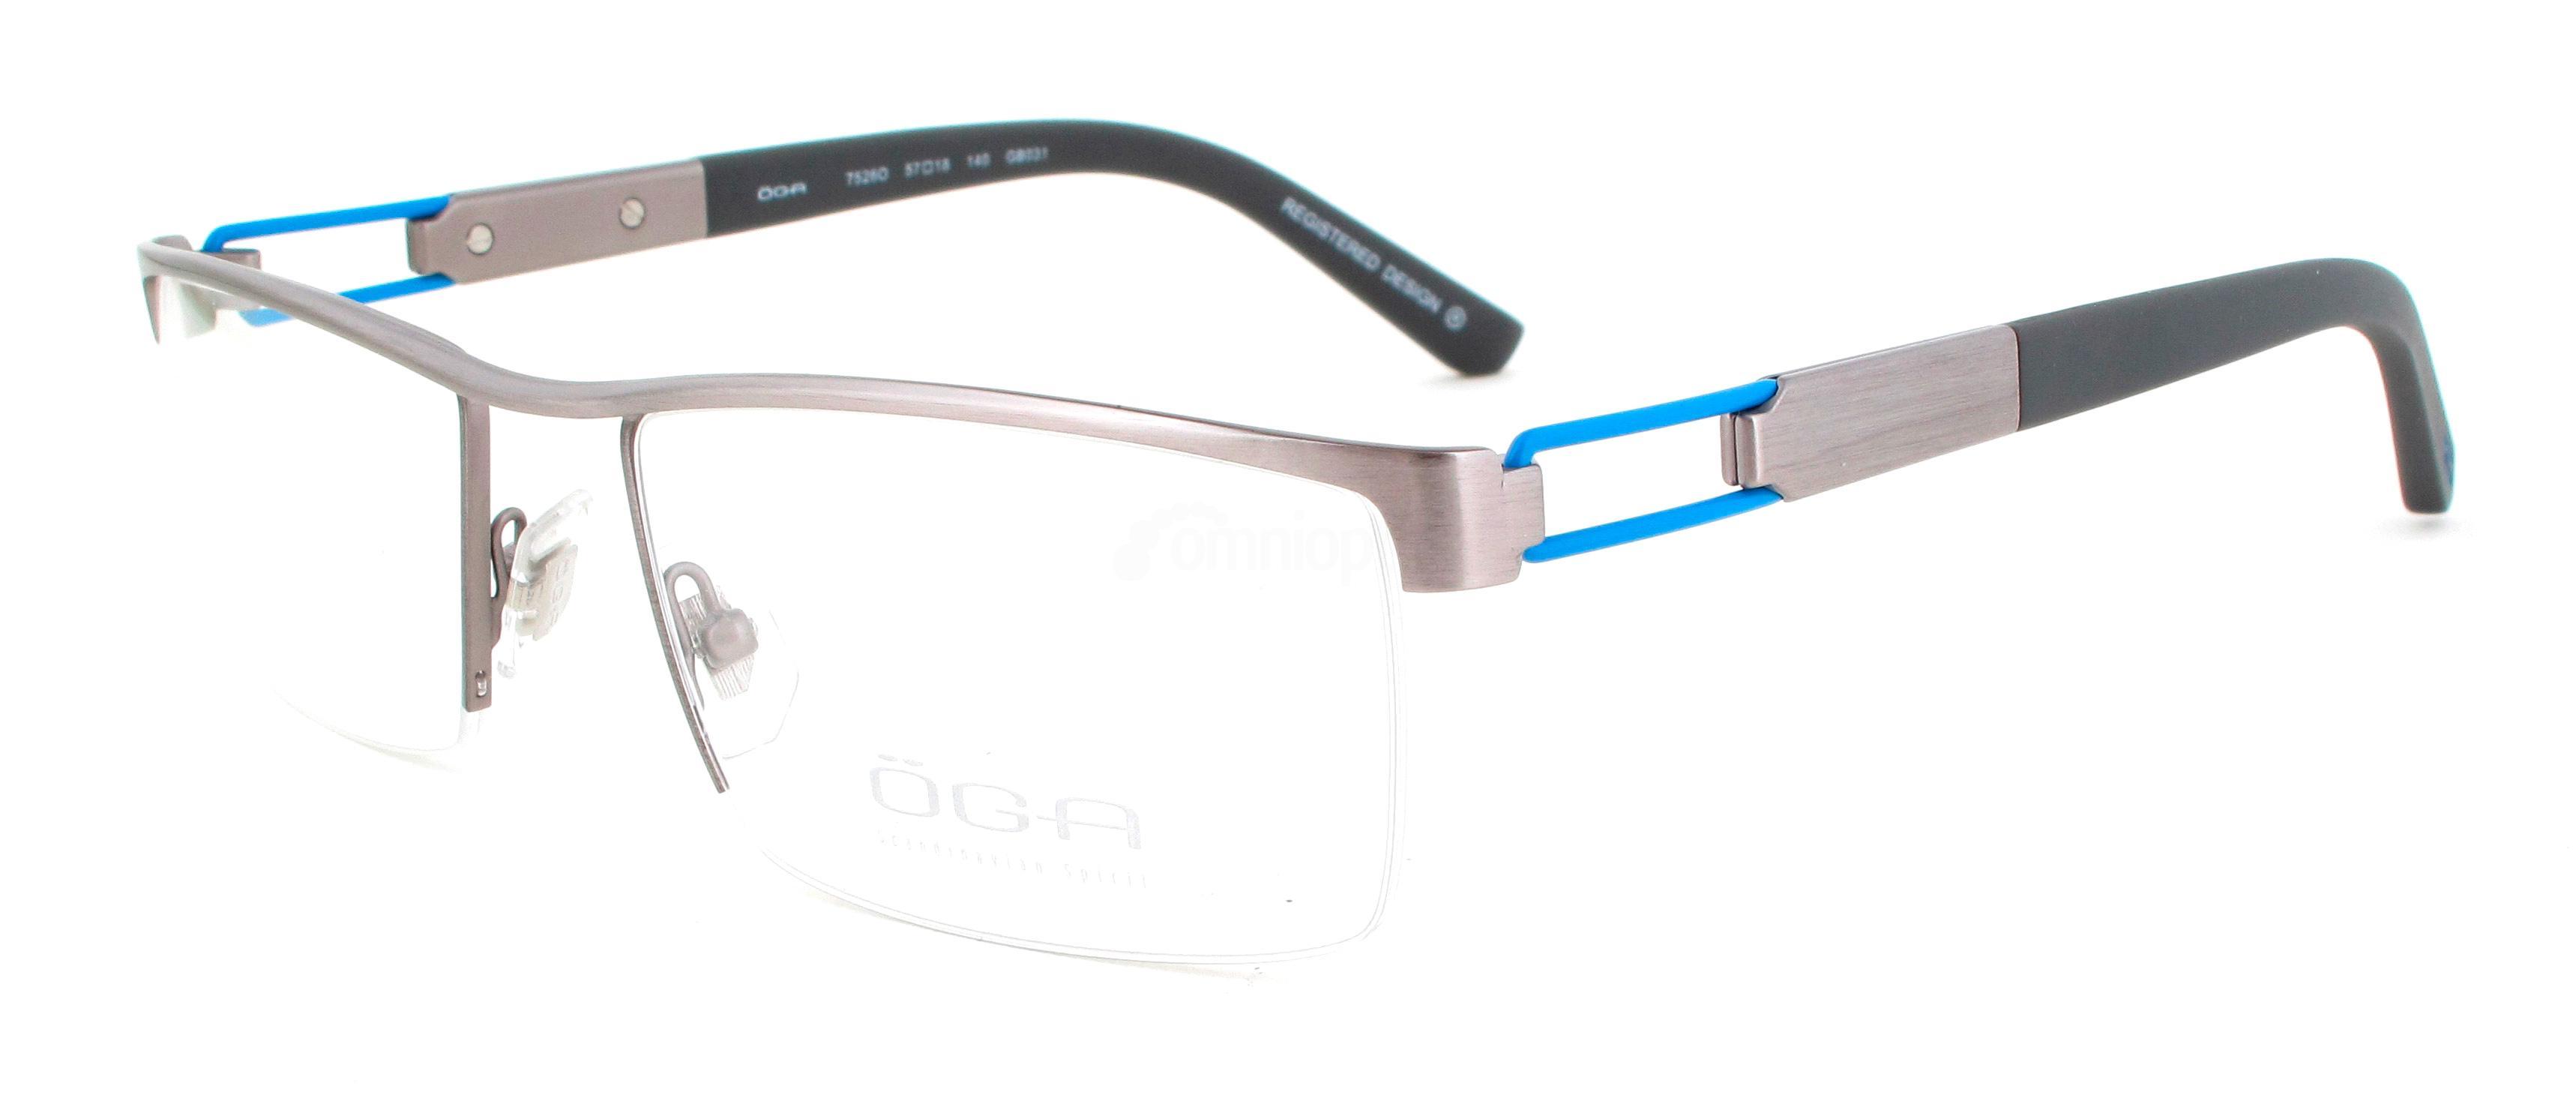 GB031 7526O TRAD 3 Glasses, ÖGA Scandinavian Spirit